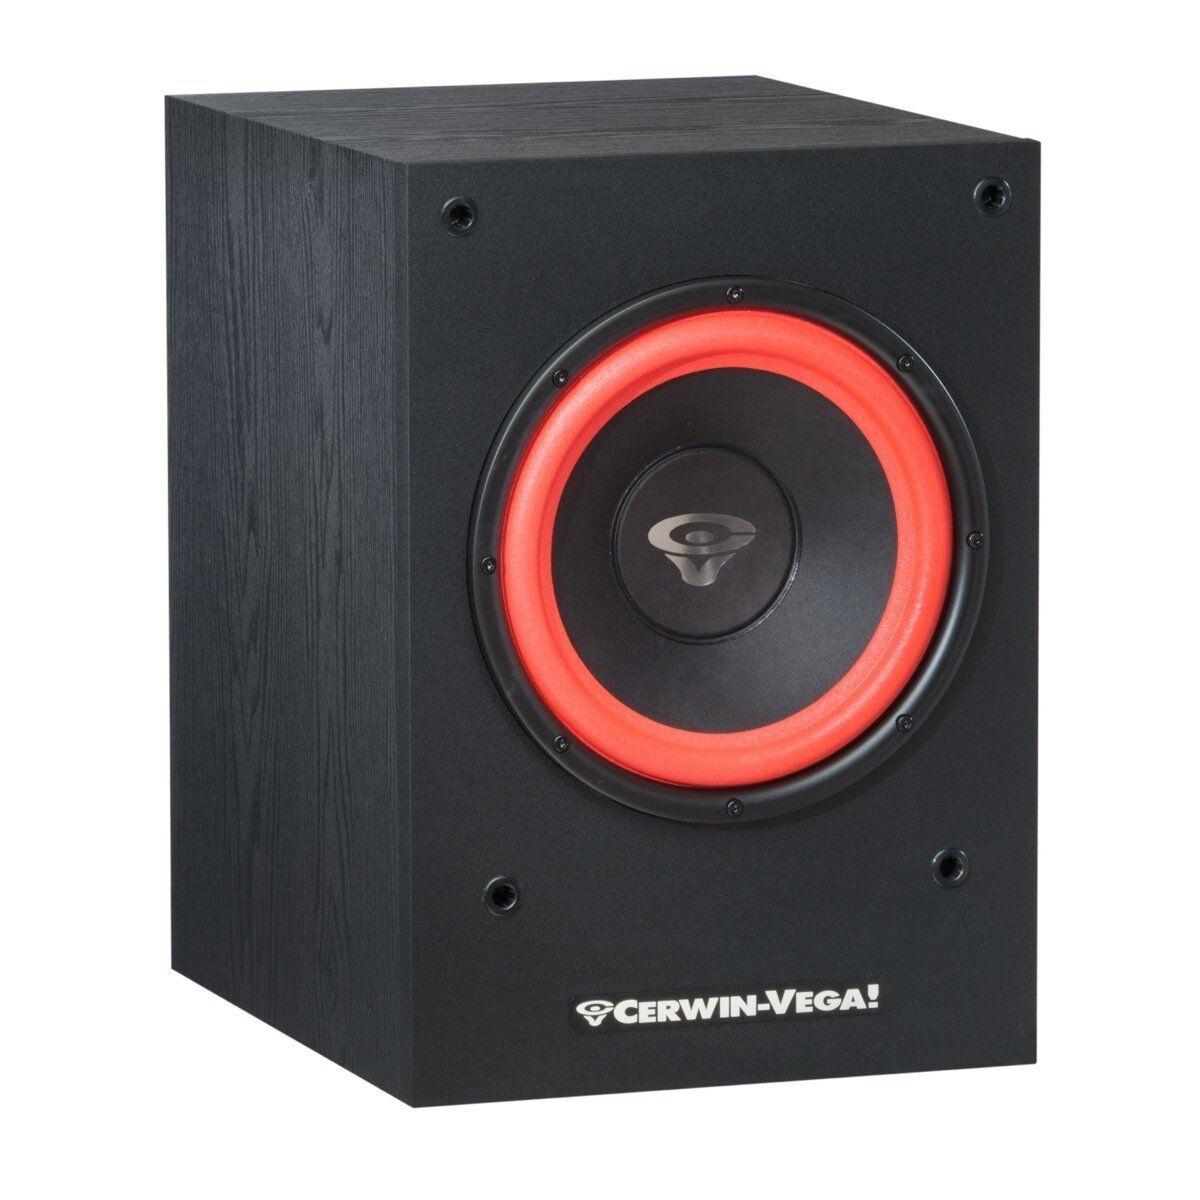 Classic Cerwin Vega Home Audio SL-10S 10  Powered Subwoofer 212Watt Built in Amp